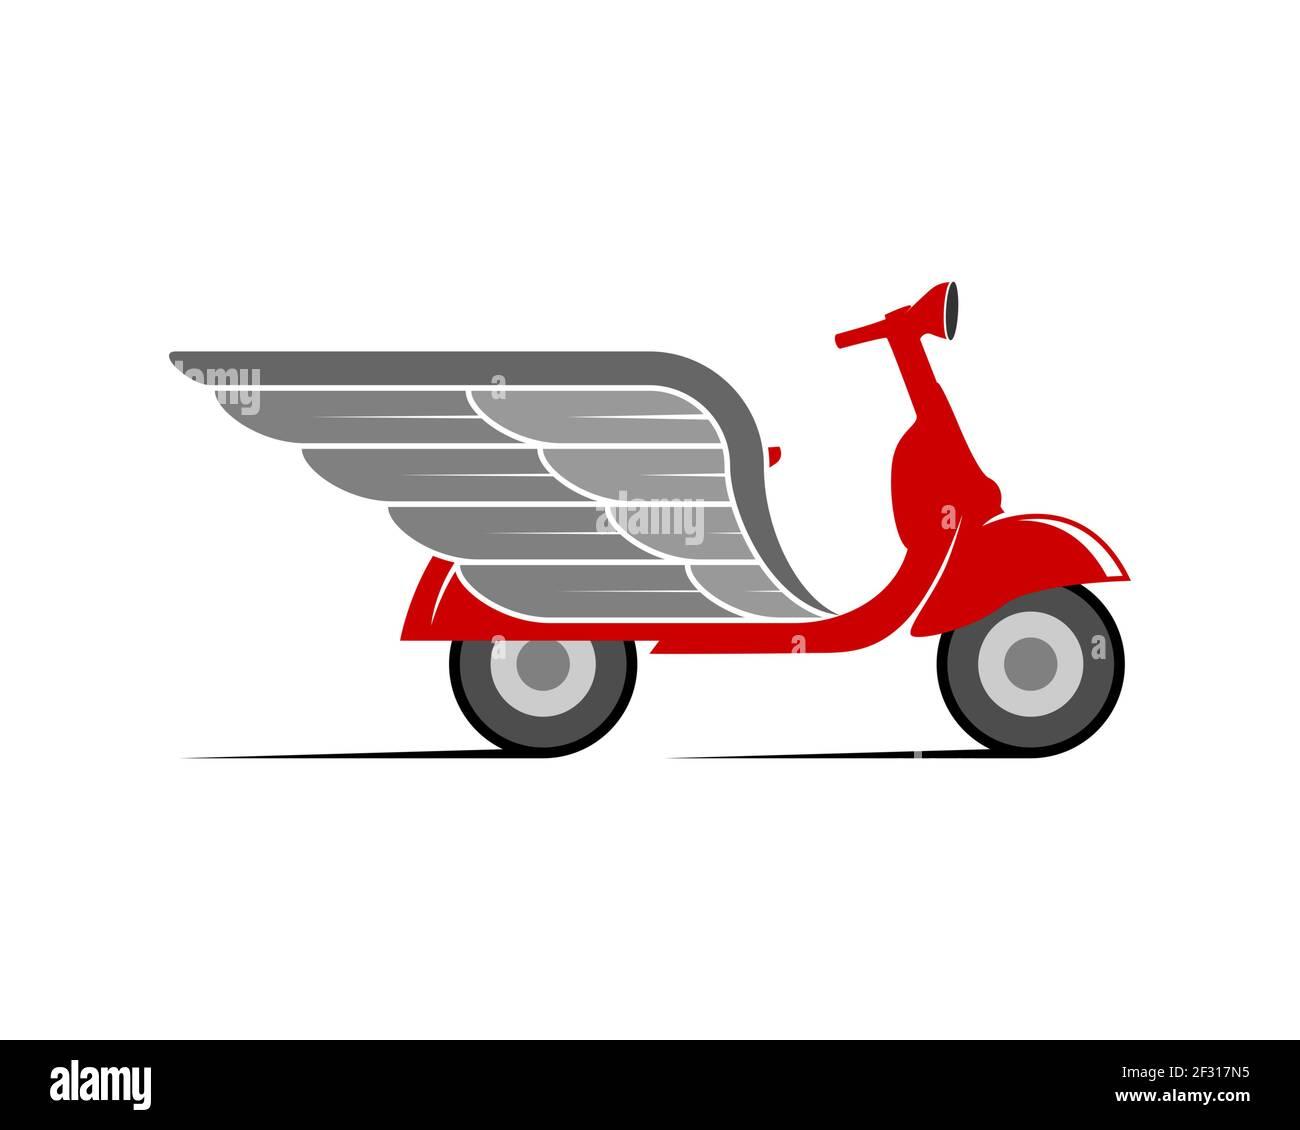 Entrega de scooter con alas plateadas Foto de stock